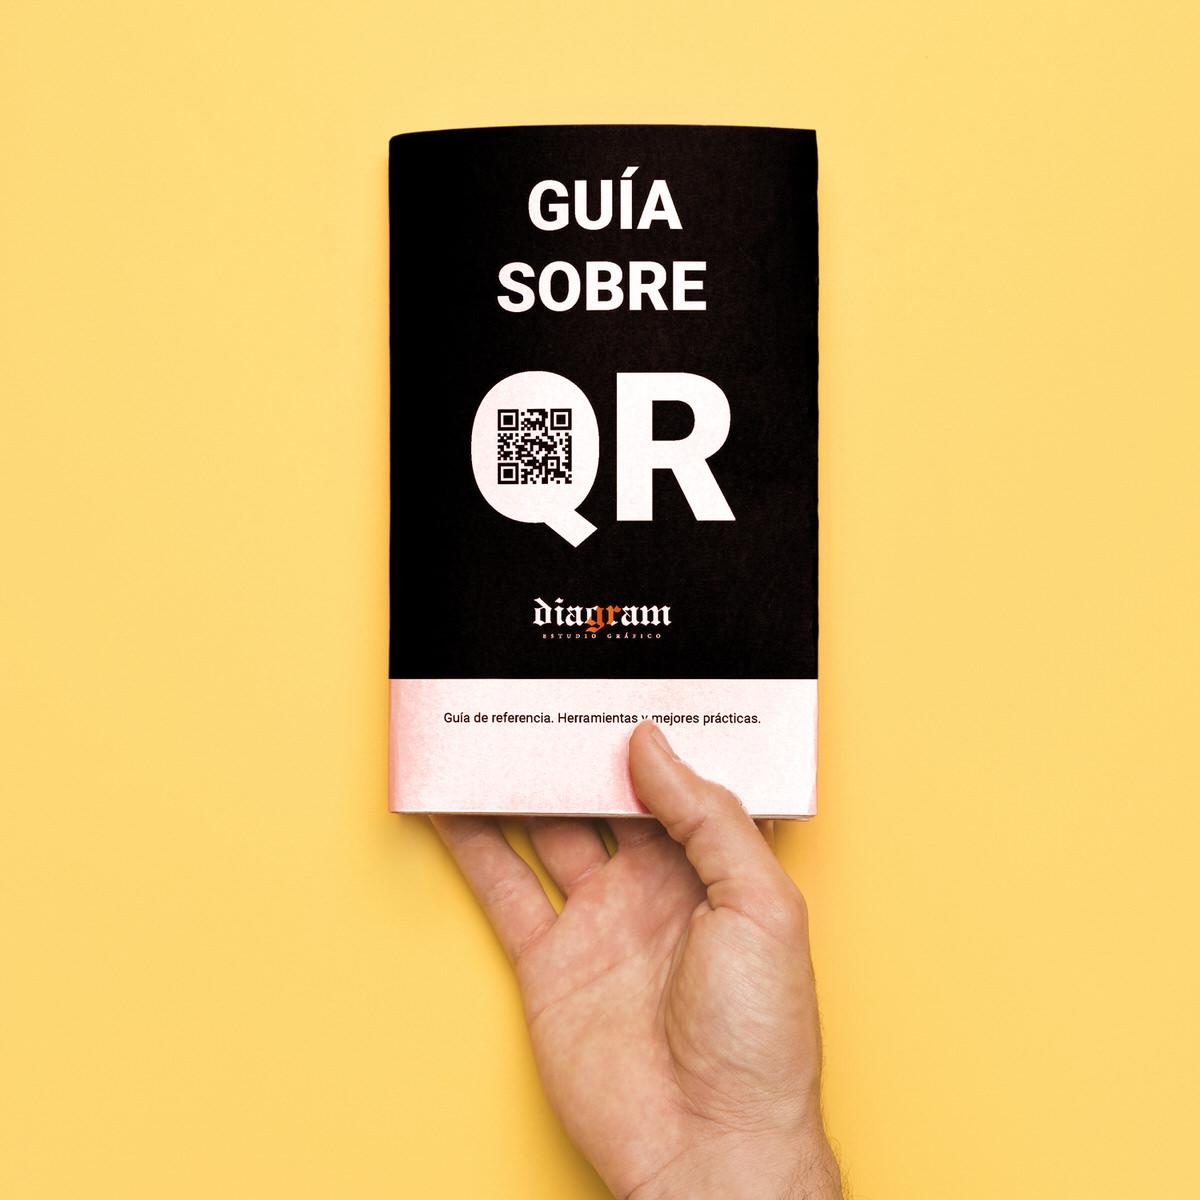 Guía sobre códigos QR